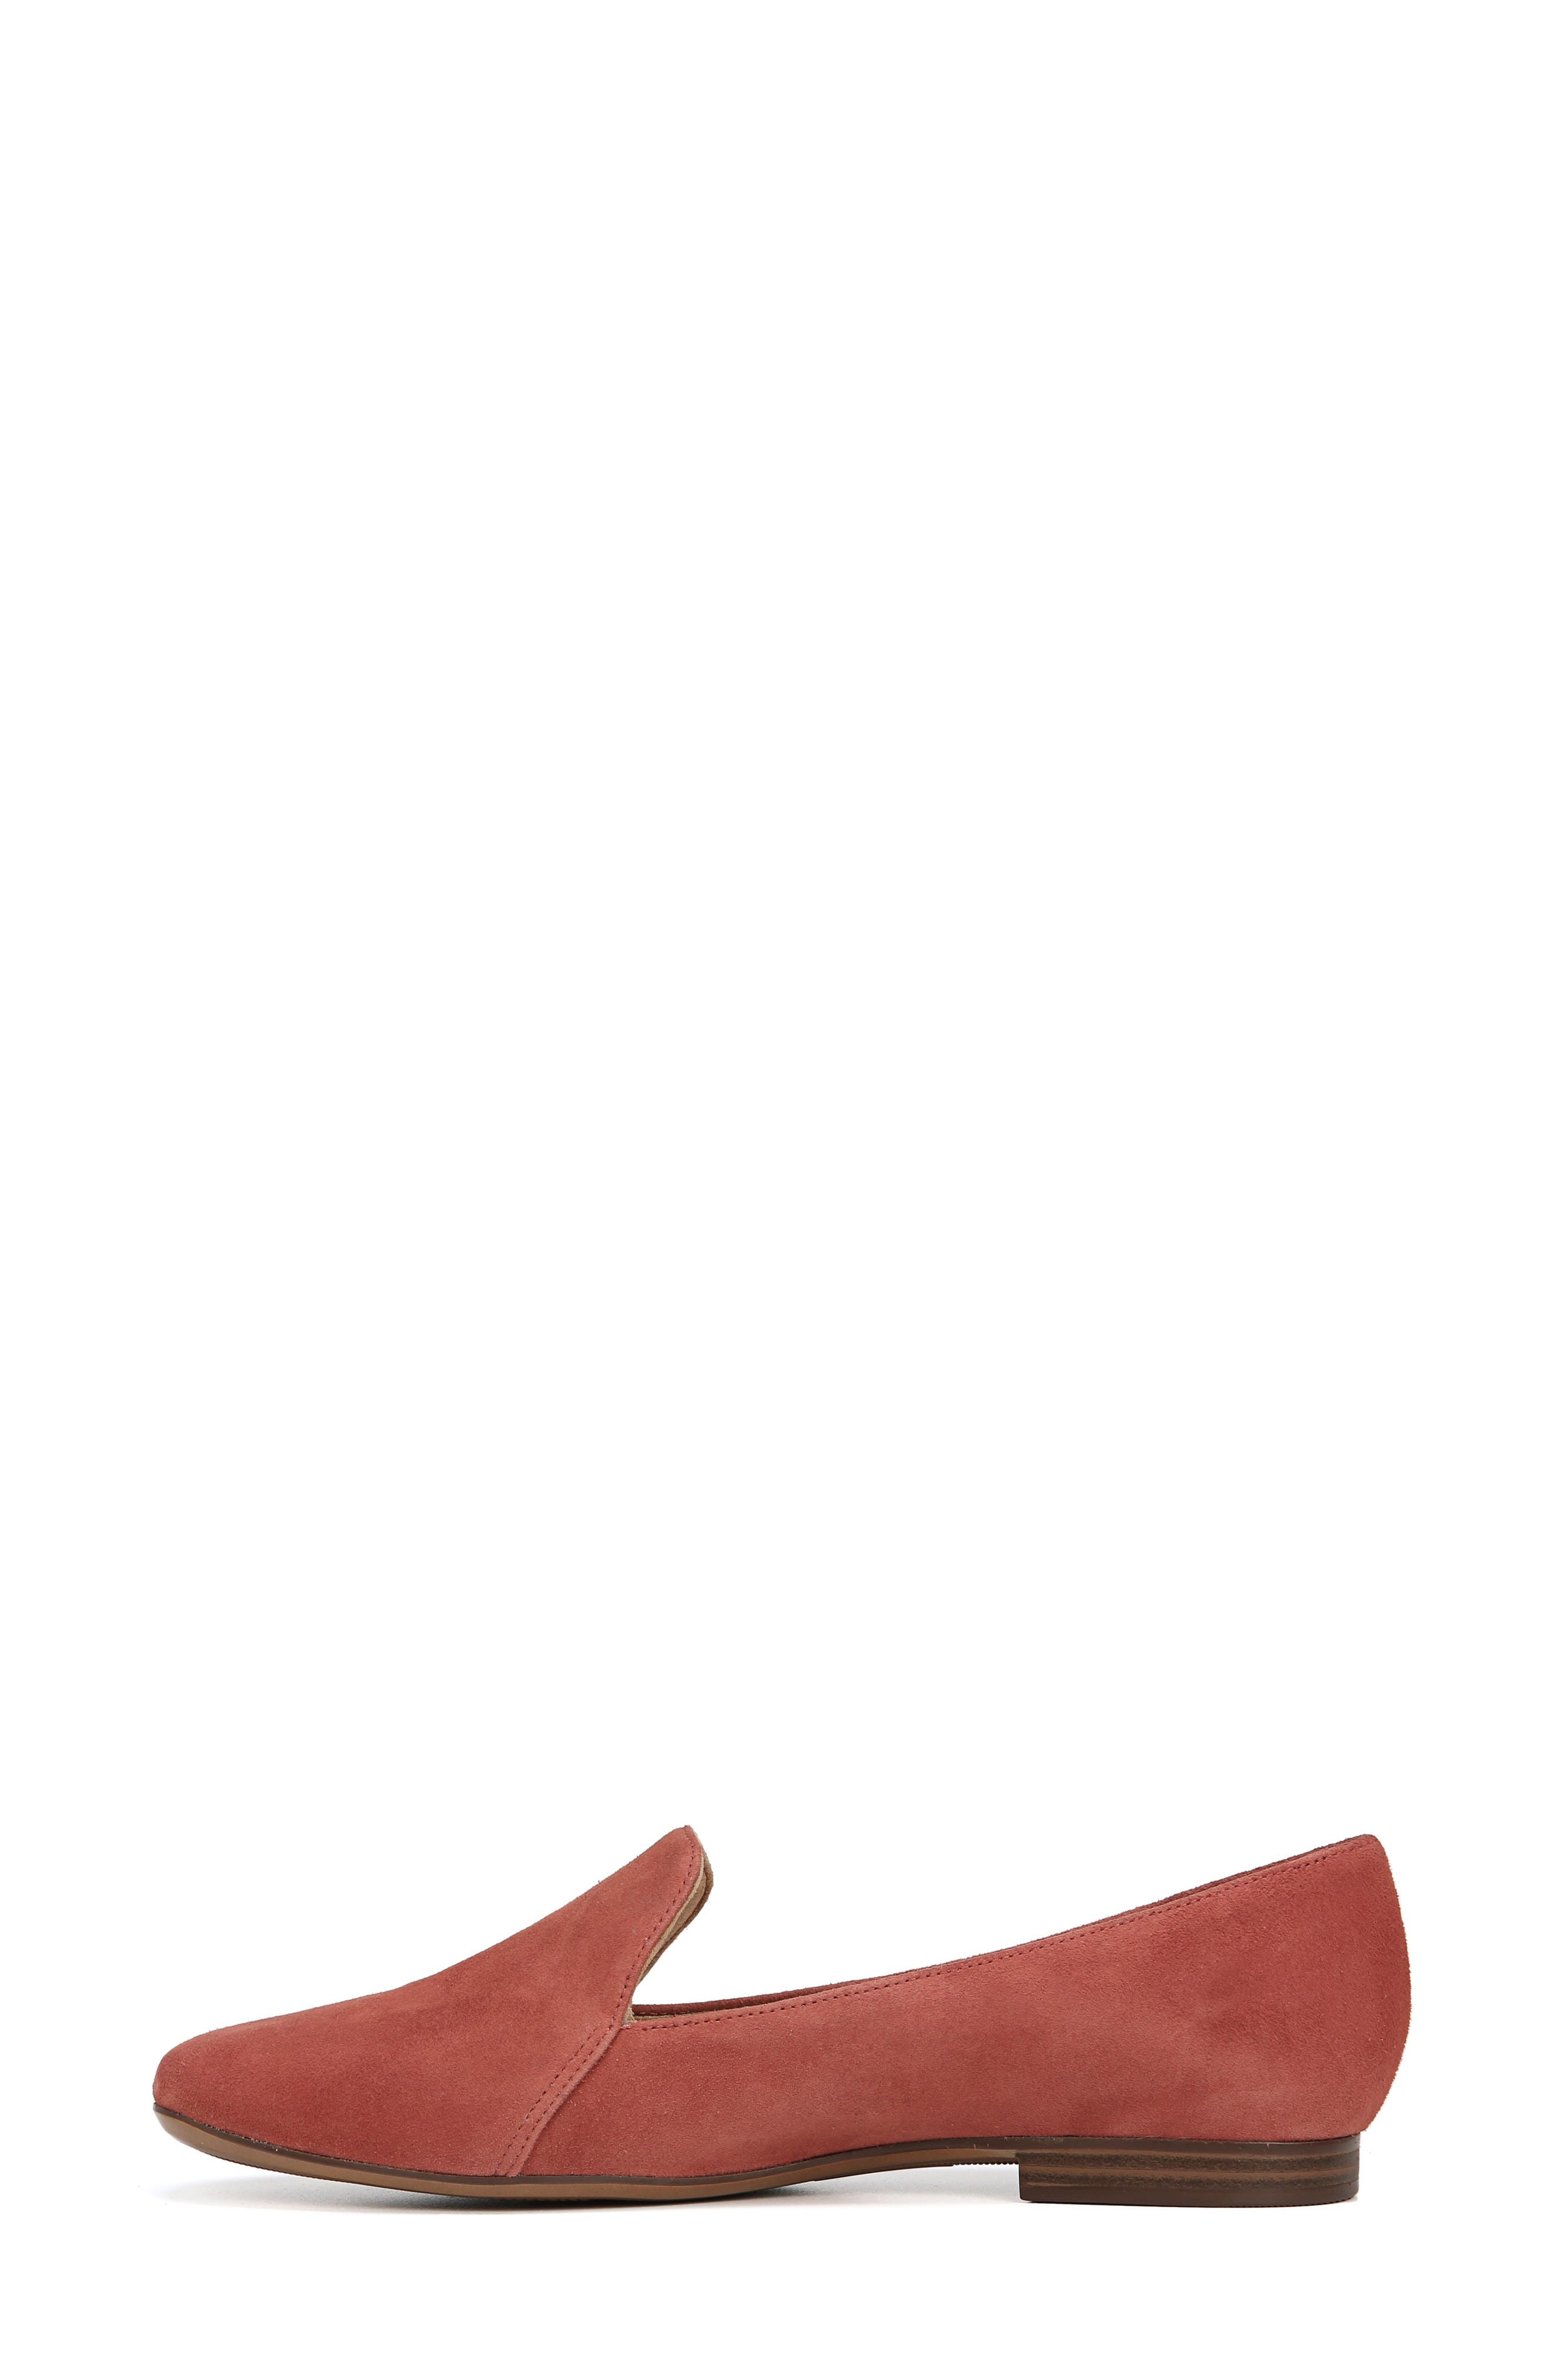 Emiline Flat Loafer,                             Alternate thumbnail 9, color,                             DESERT CLAY SUEDE